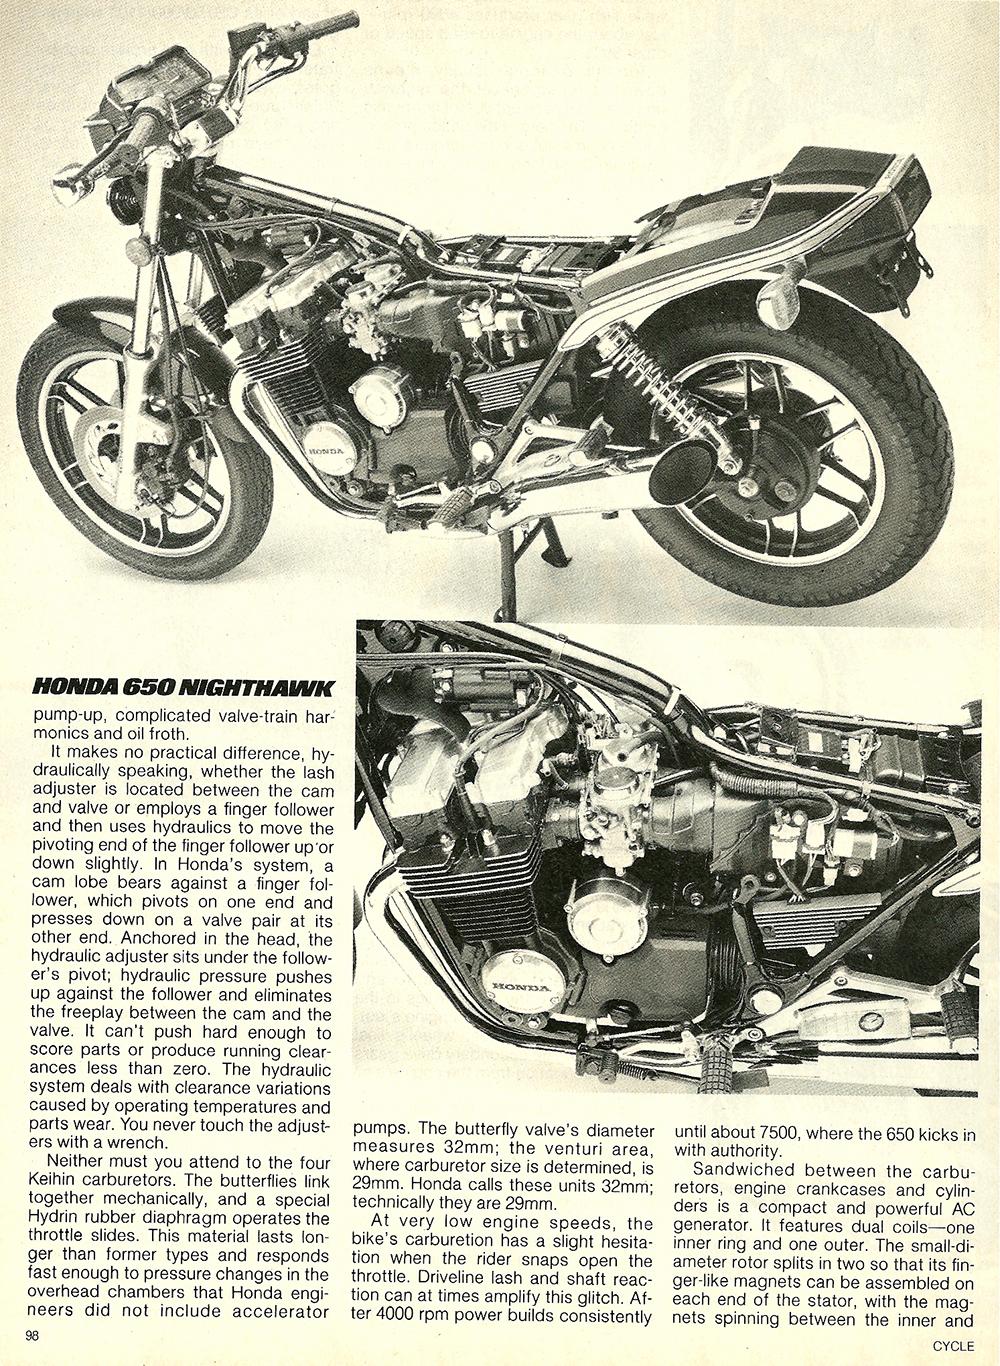 1983 Honda CB650SC Nighthawk road test 5.jpg